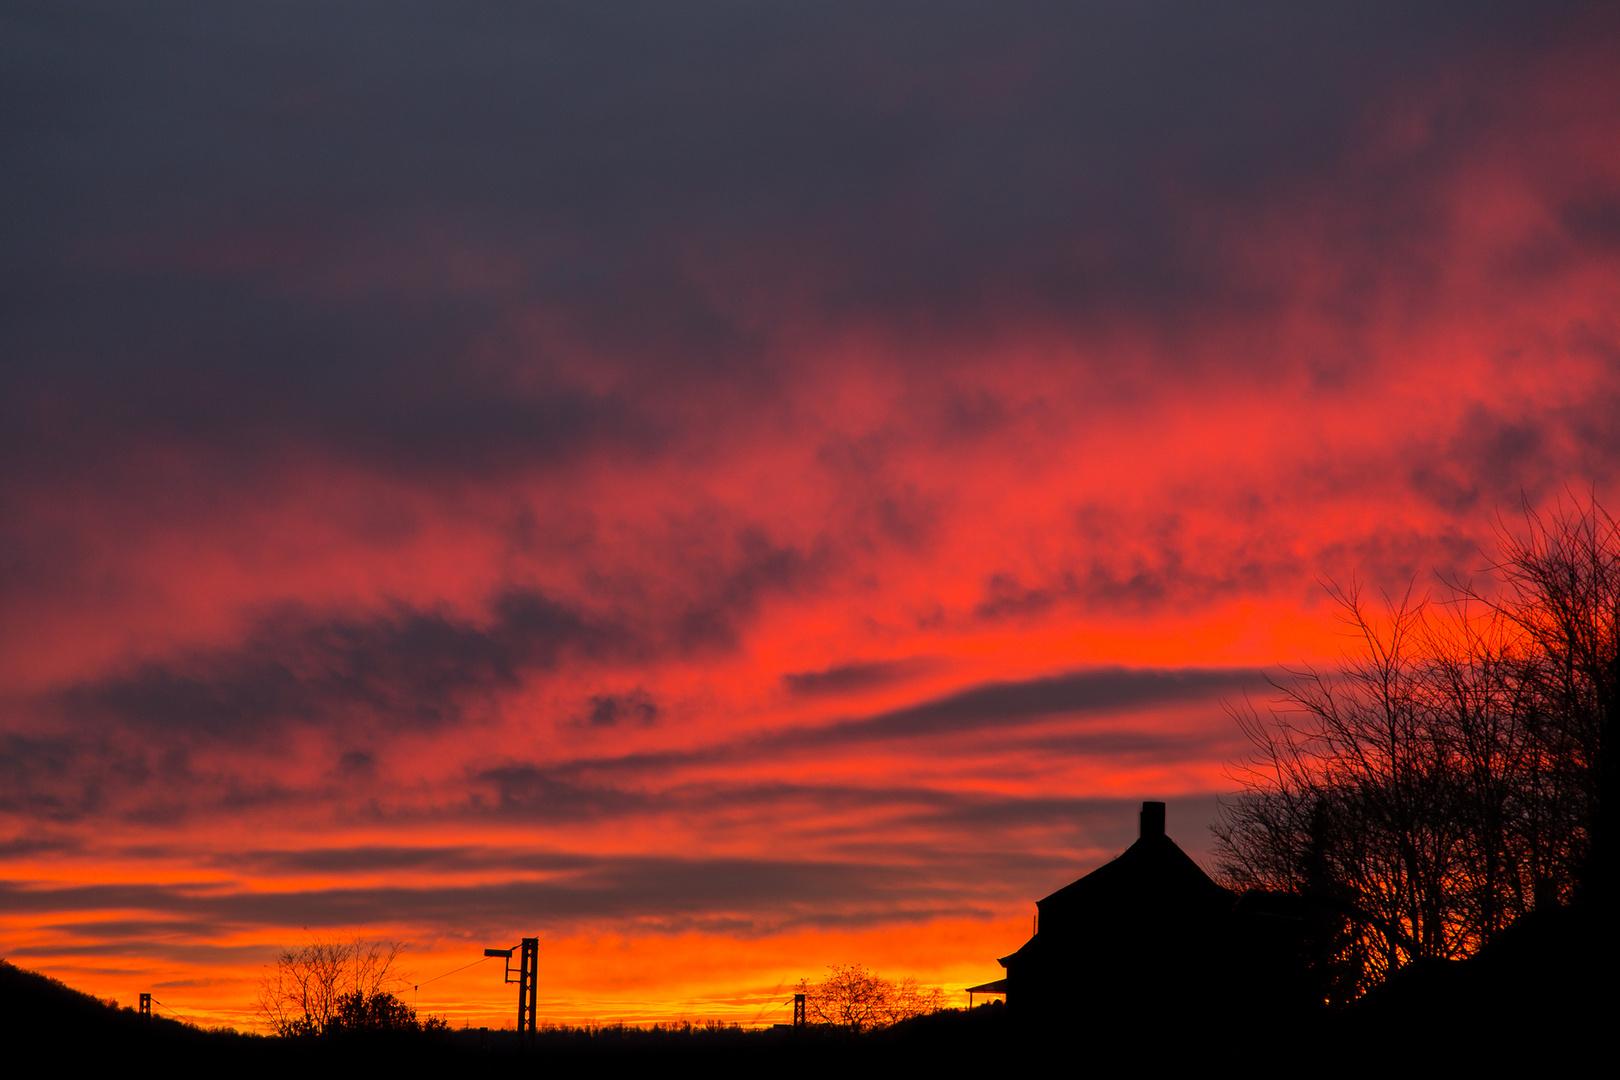 Sonnenuntergang 29.12.12